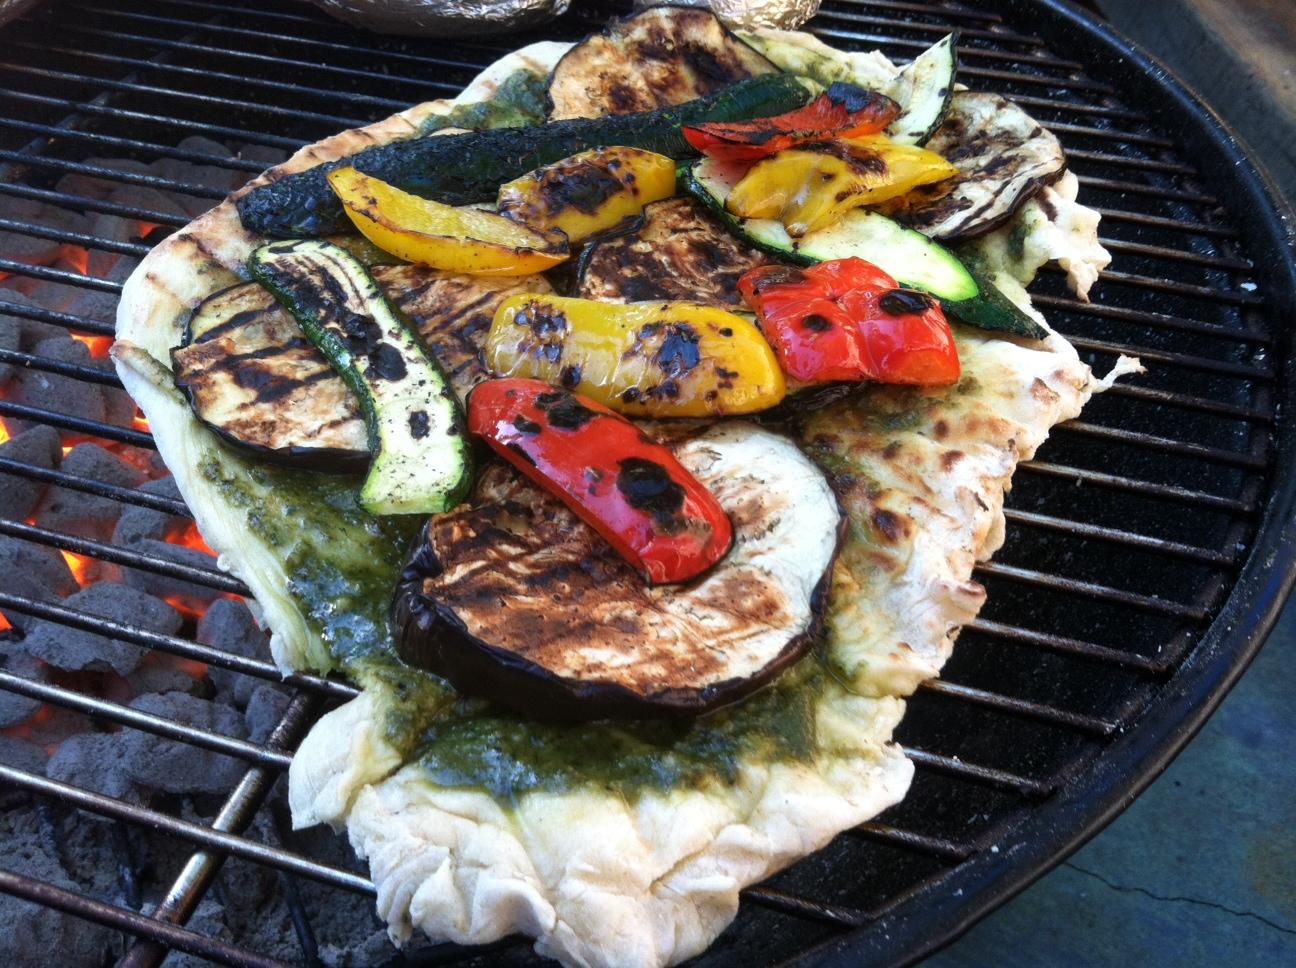 Vegan Beezie: Grilled Vegan Pizza